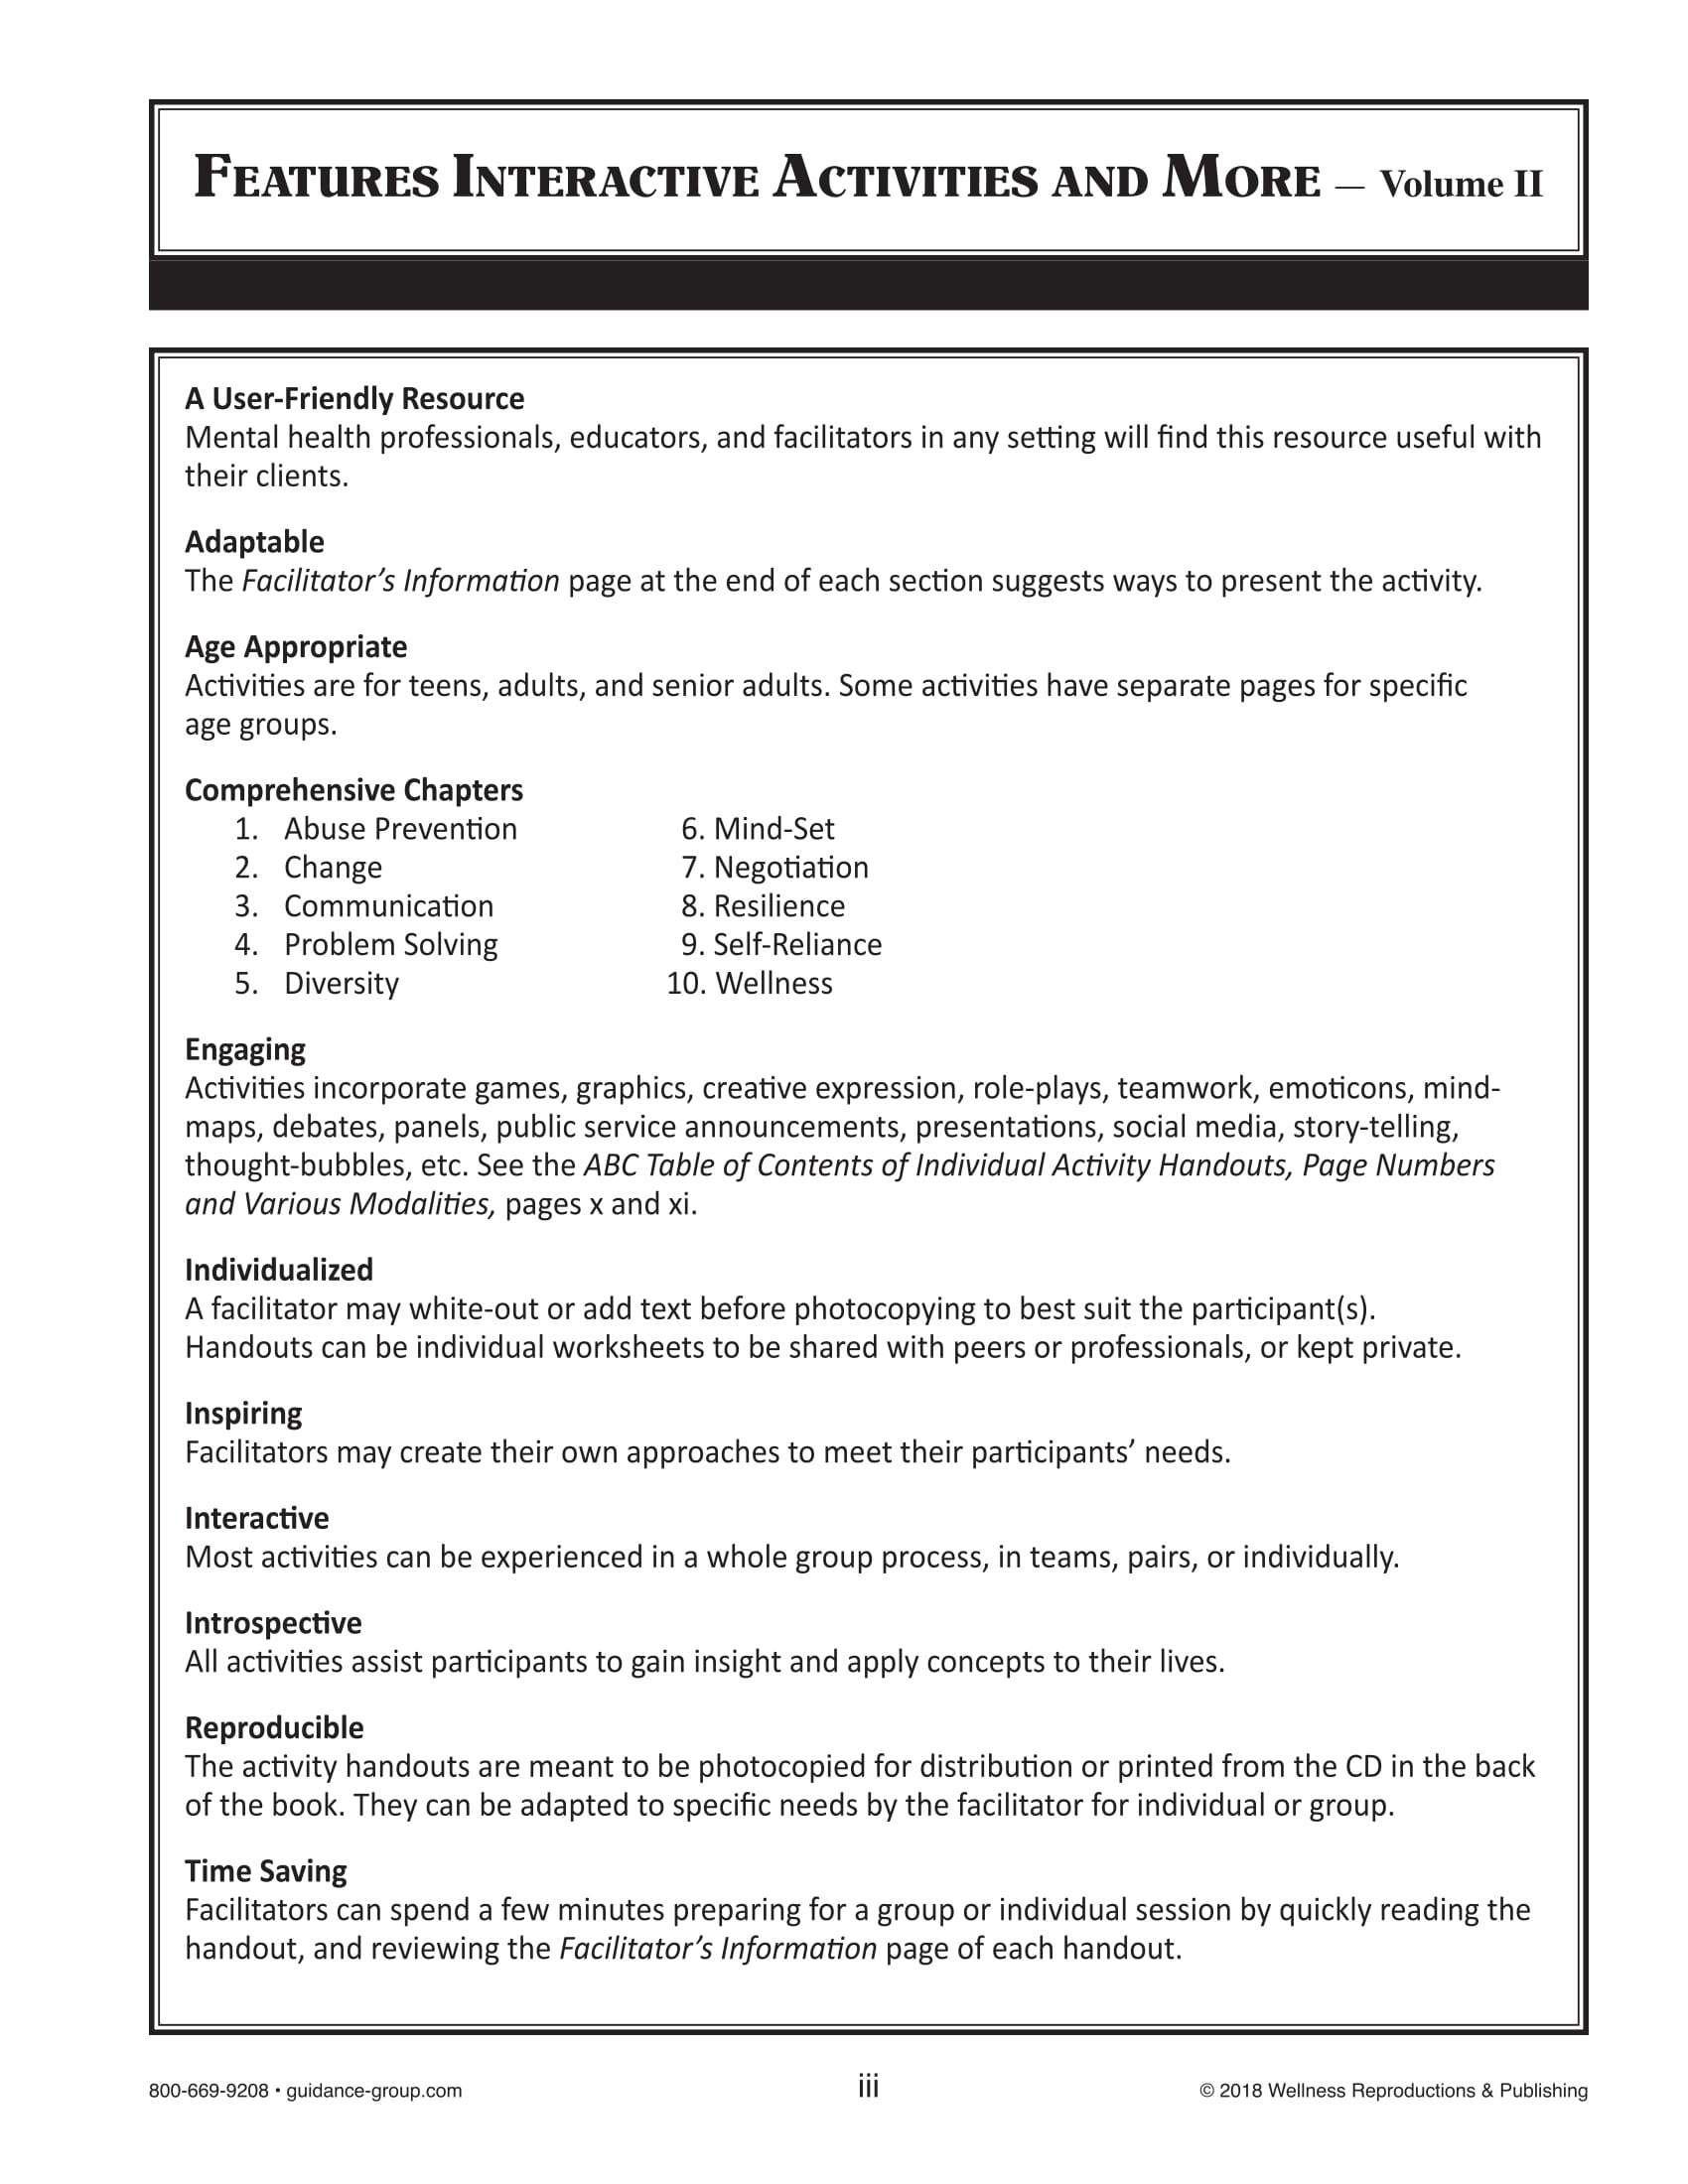 Nonverbal Communication Worksheet Answers